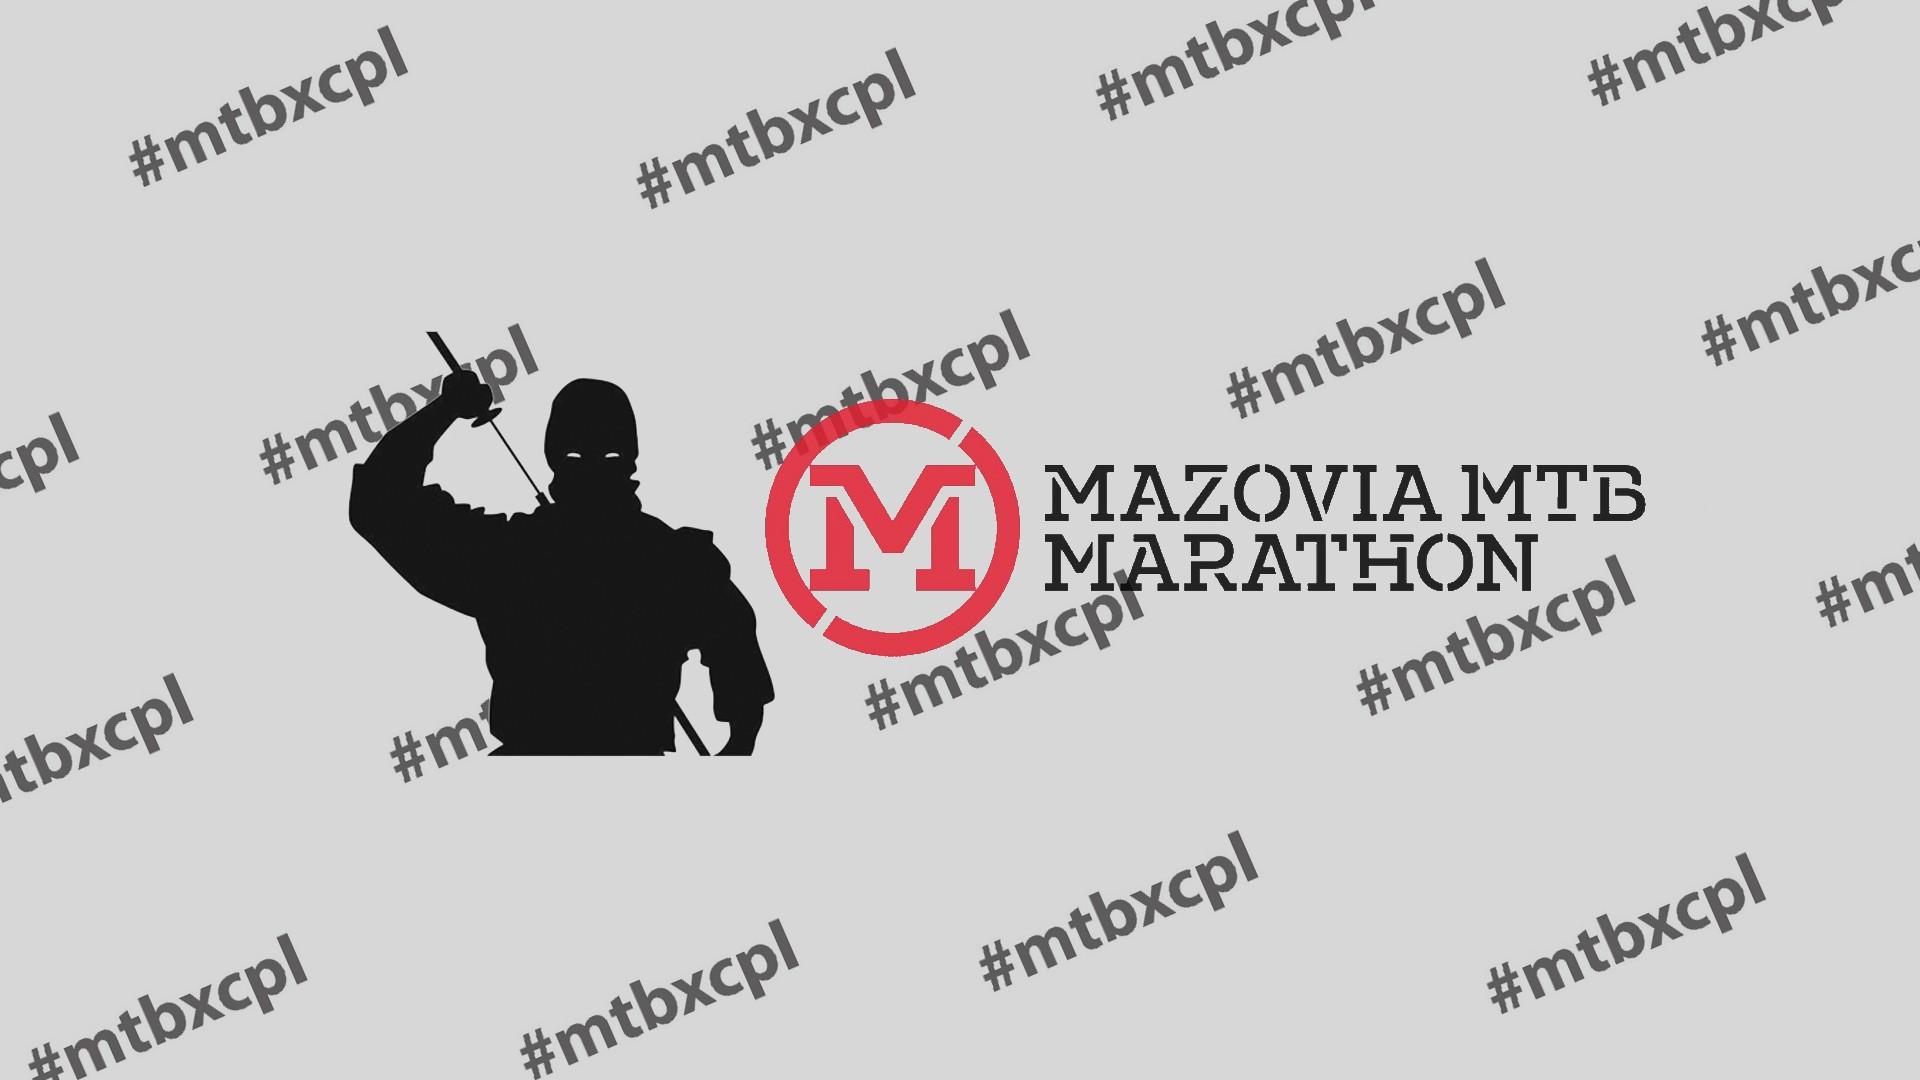 Amator donosi: Mazovia MTB Marathon, Ciechanów